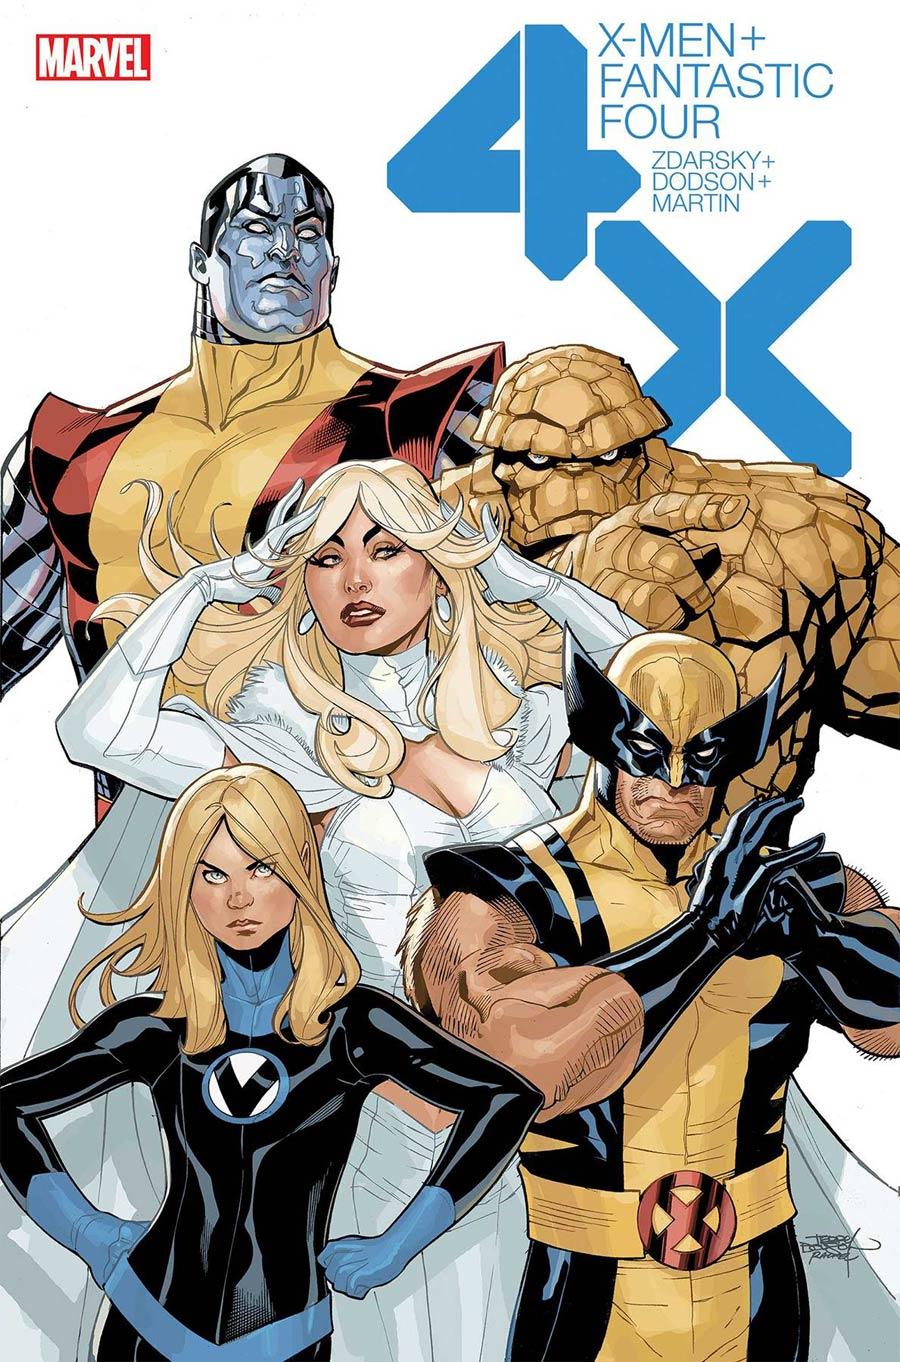 X-Men Fantastic Four Vol 2 #2 Cover A Regular Terry Dodson Cover